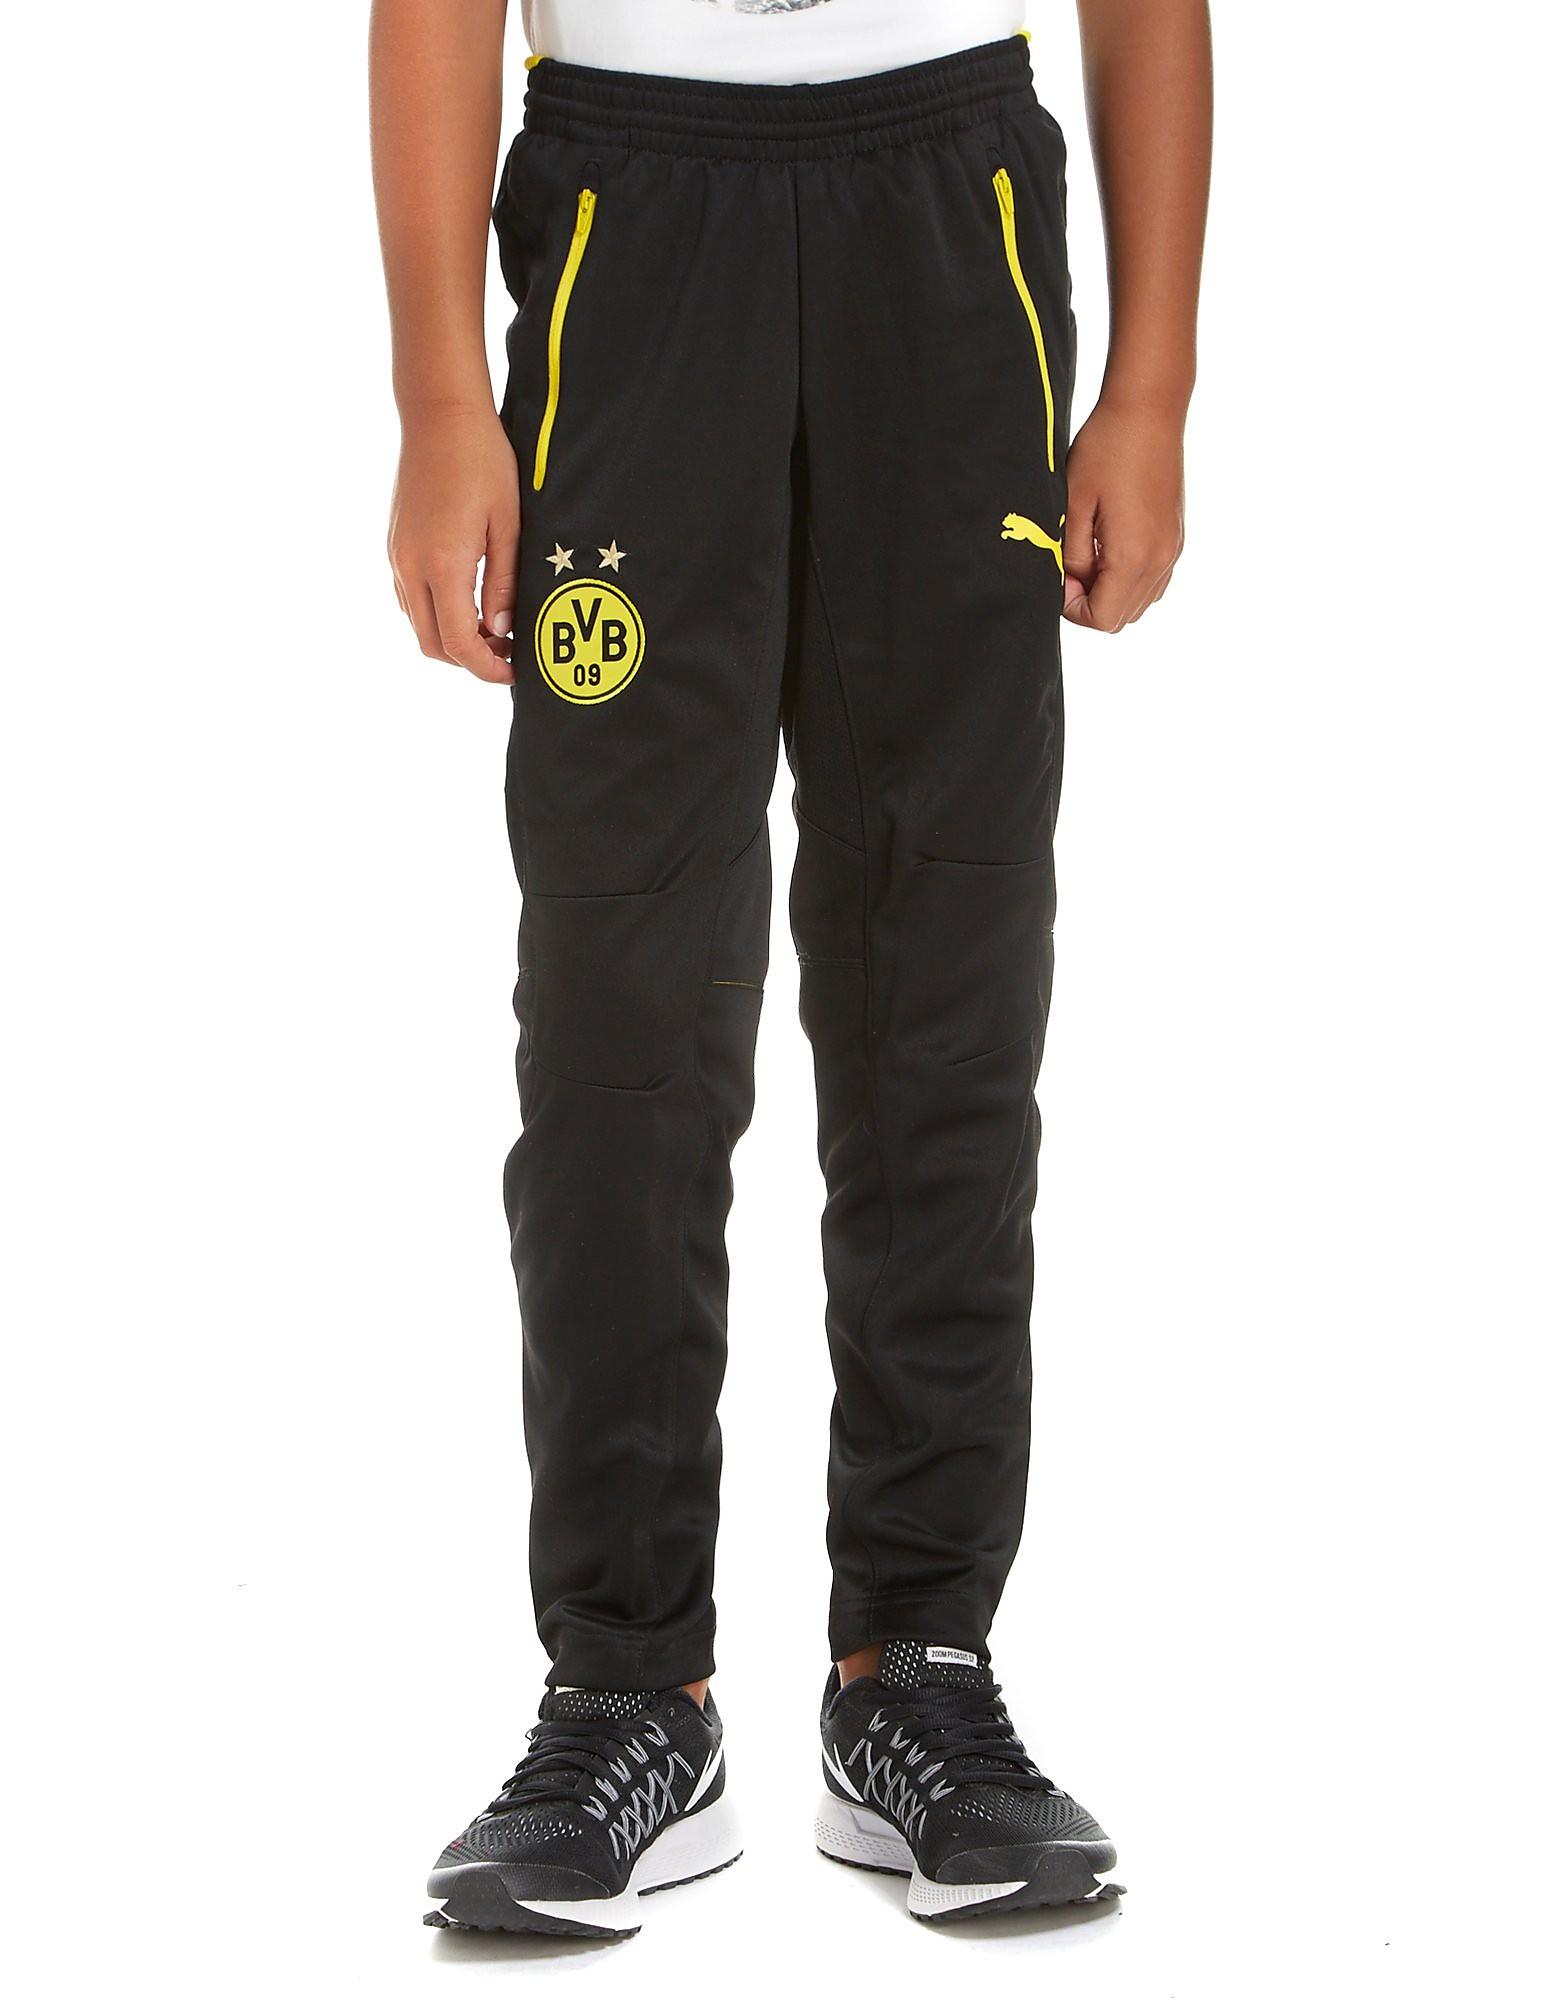 PUMA Borussia Dortmund 2017 Pants Junior